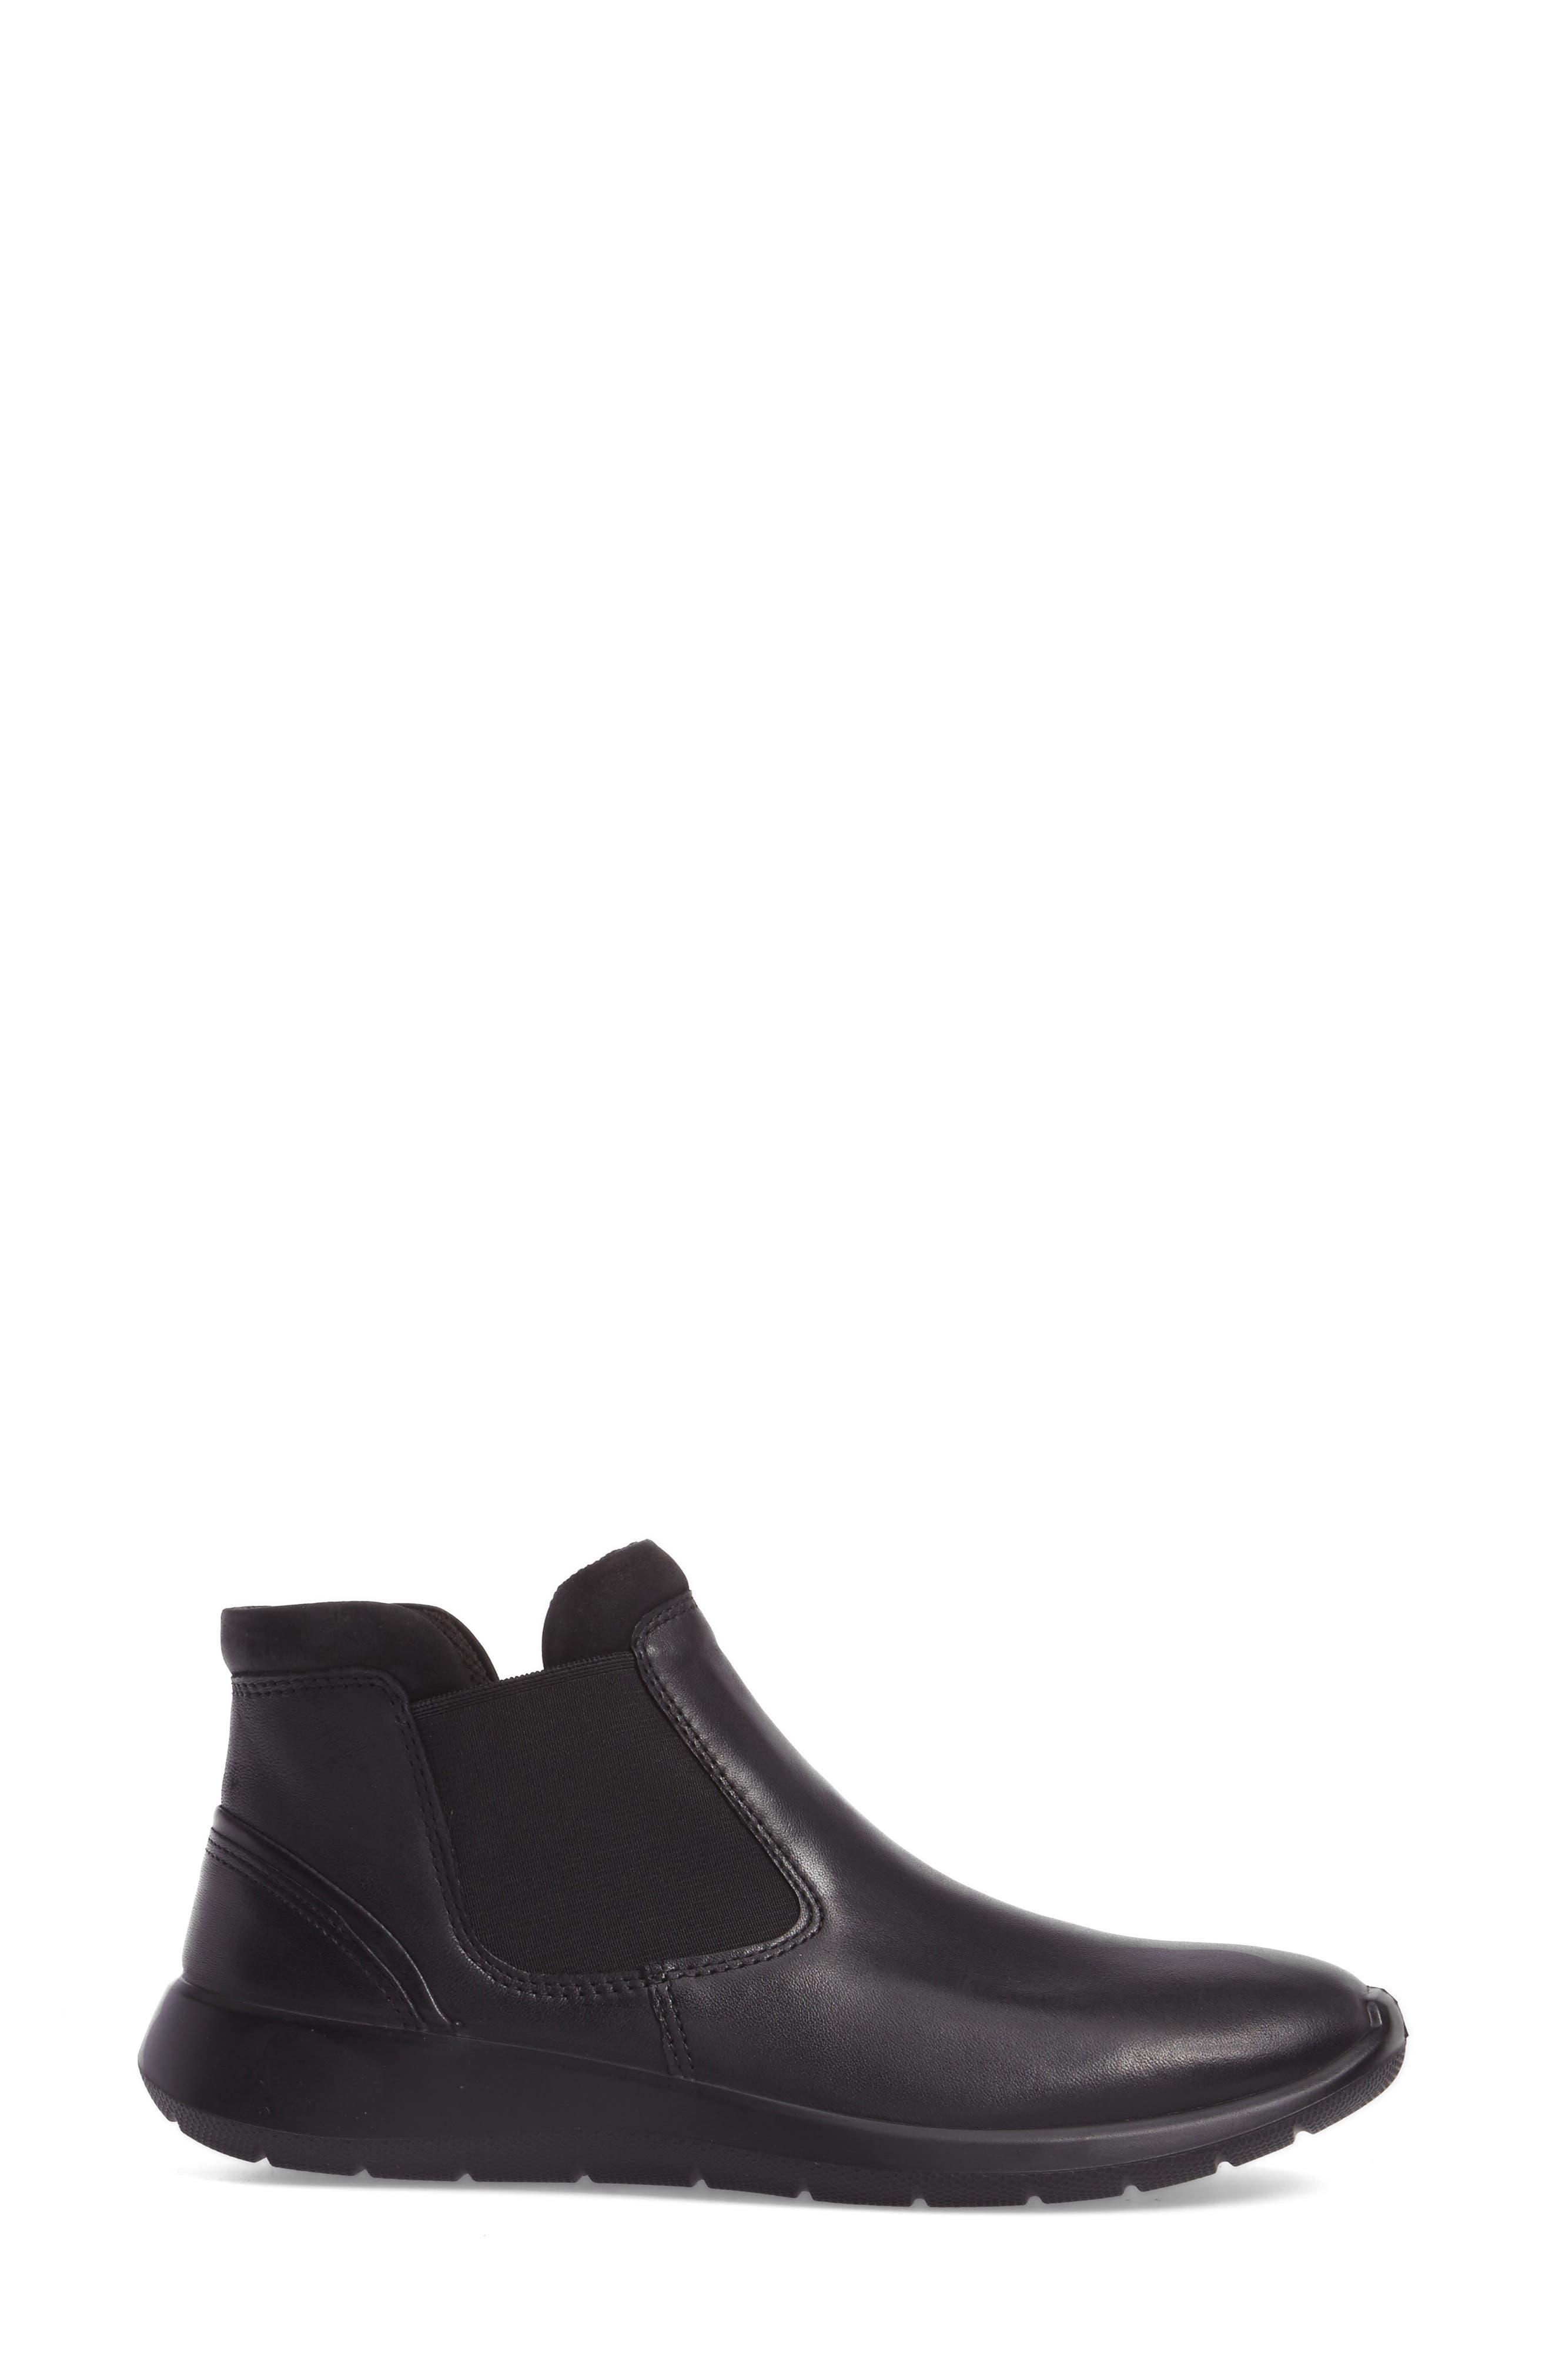 Alternate Image 3  - ECCO Soft 5 Chelsea Boot (Women)